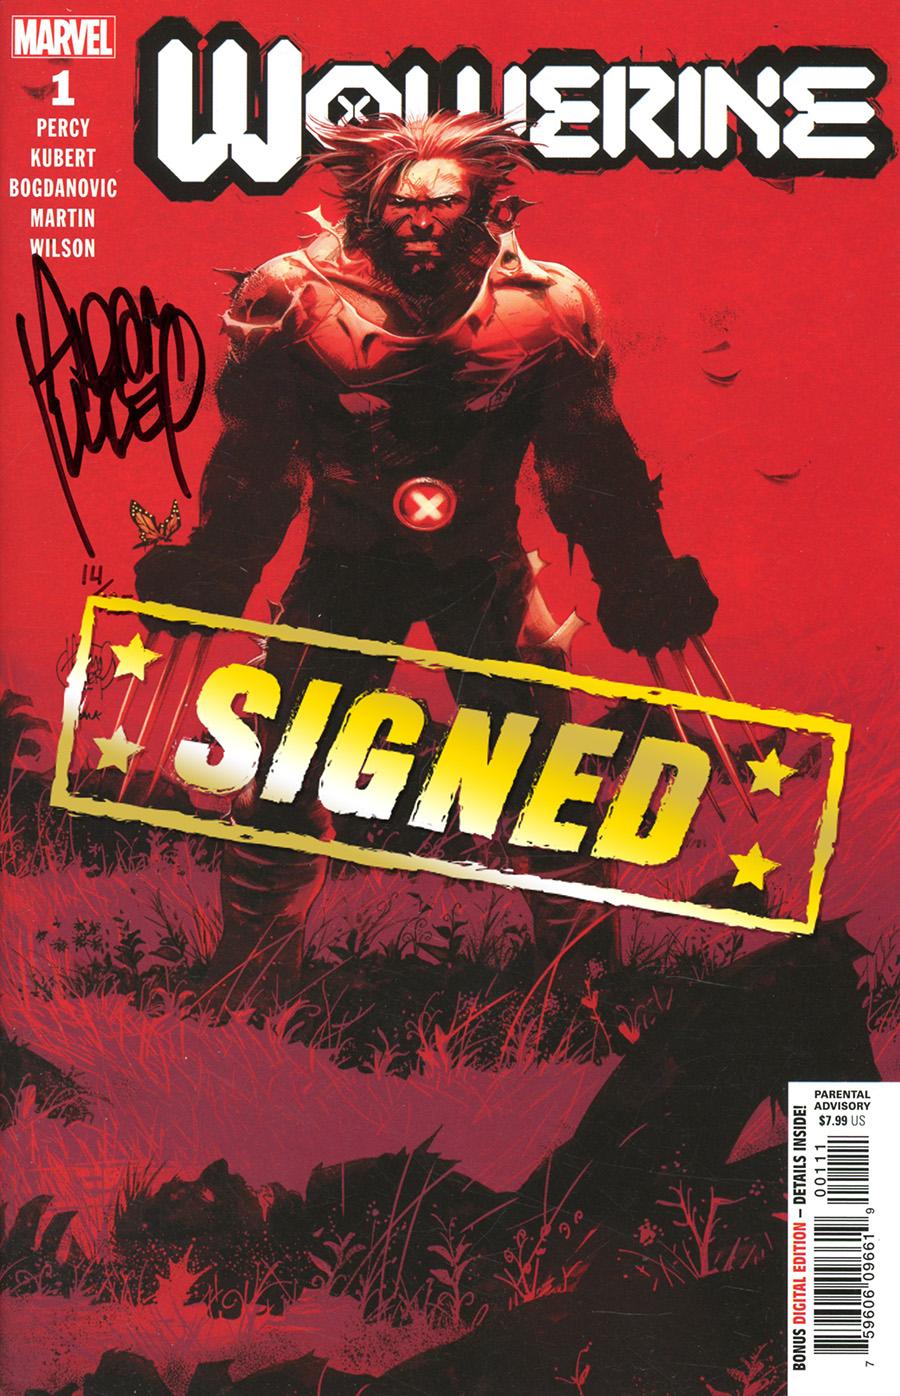 Wolverine Vol 7 #1 Cover P DF Signed By Adam Kubert (Dawn Of X Tie-In)